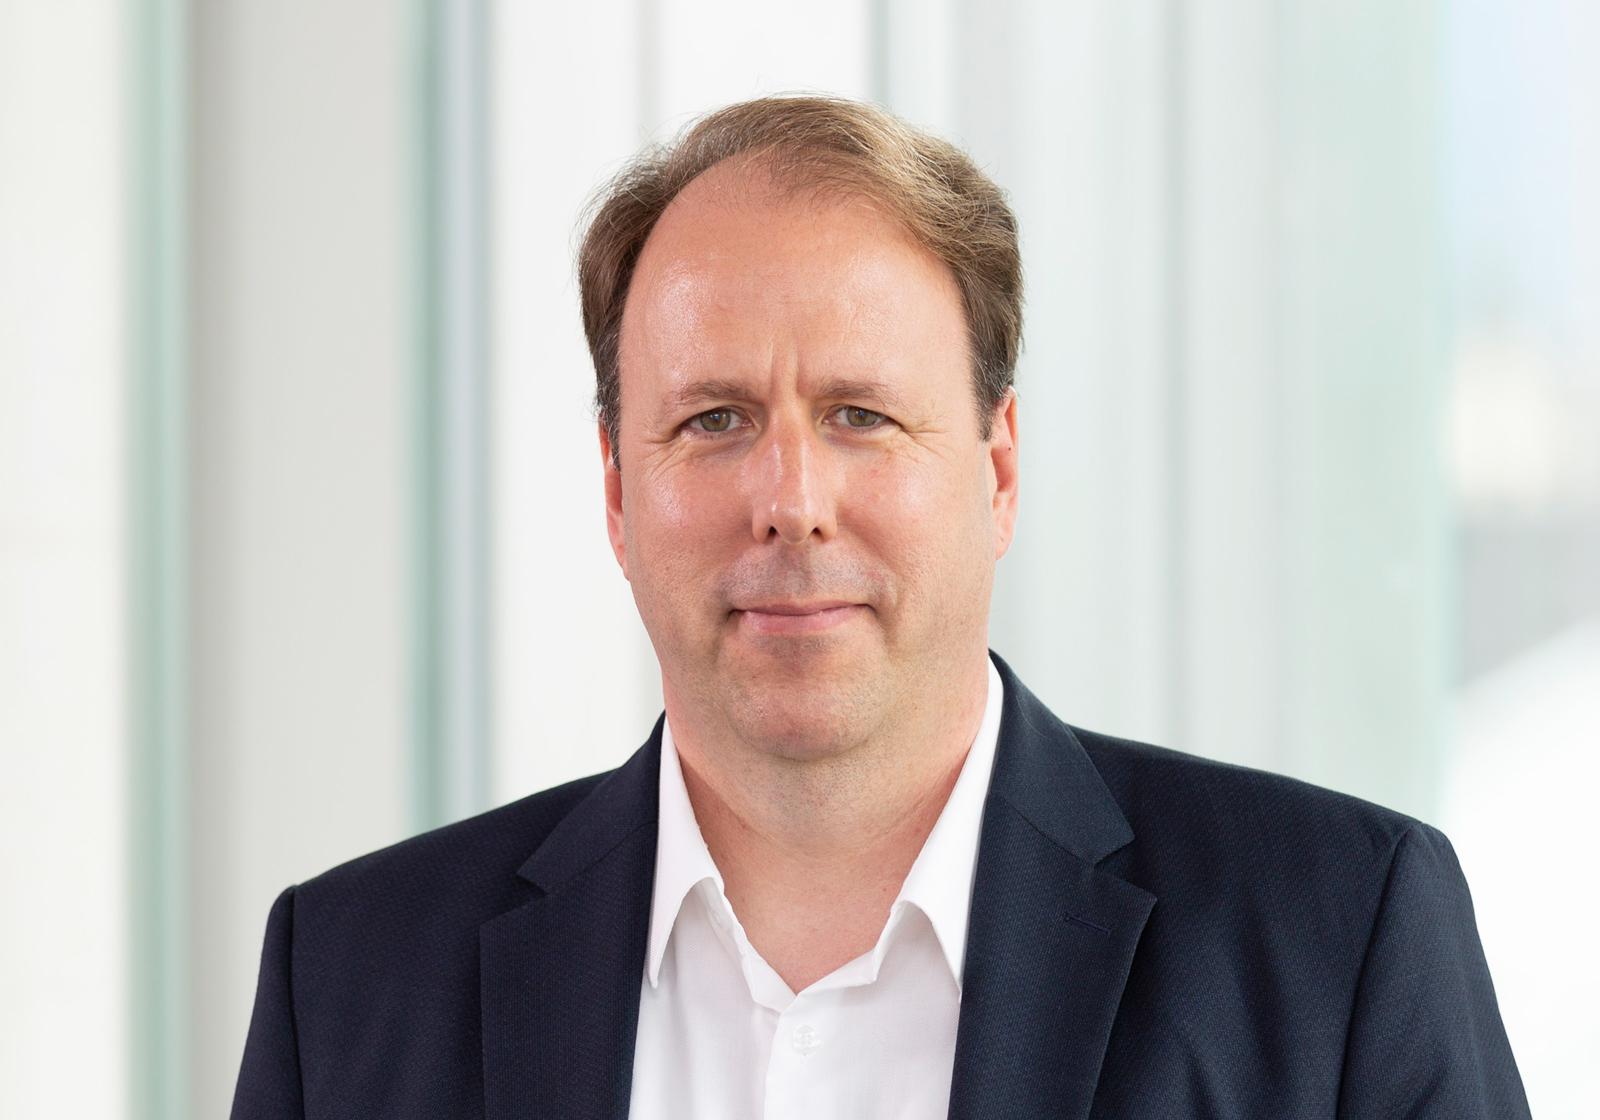 Jörg Balow